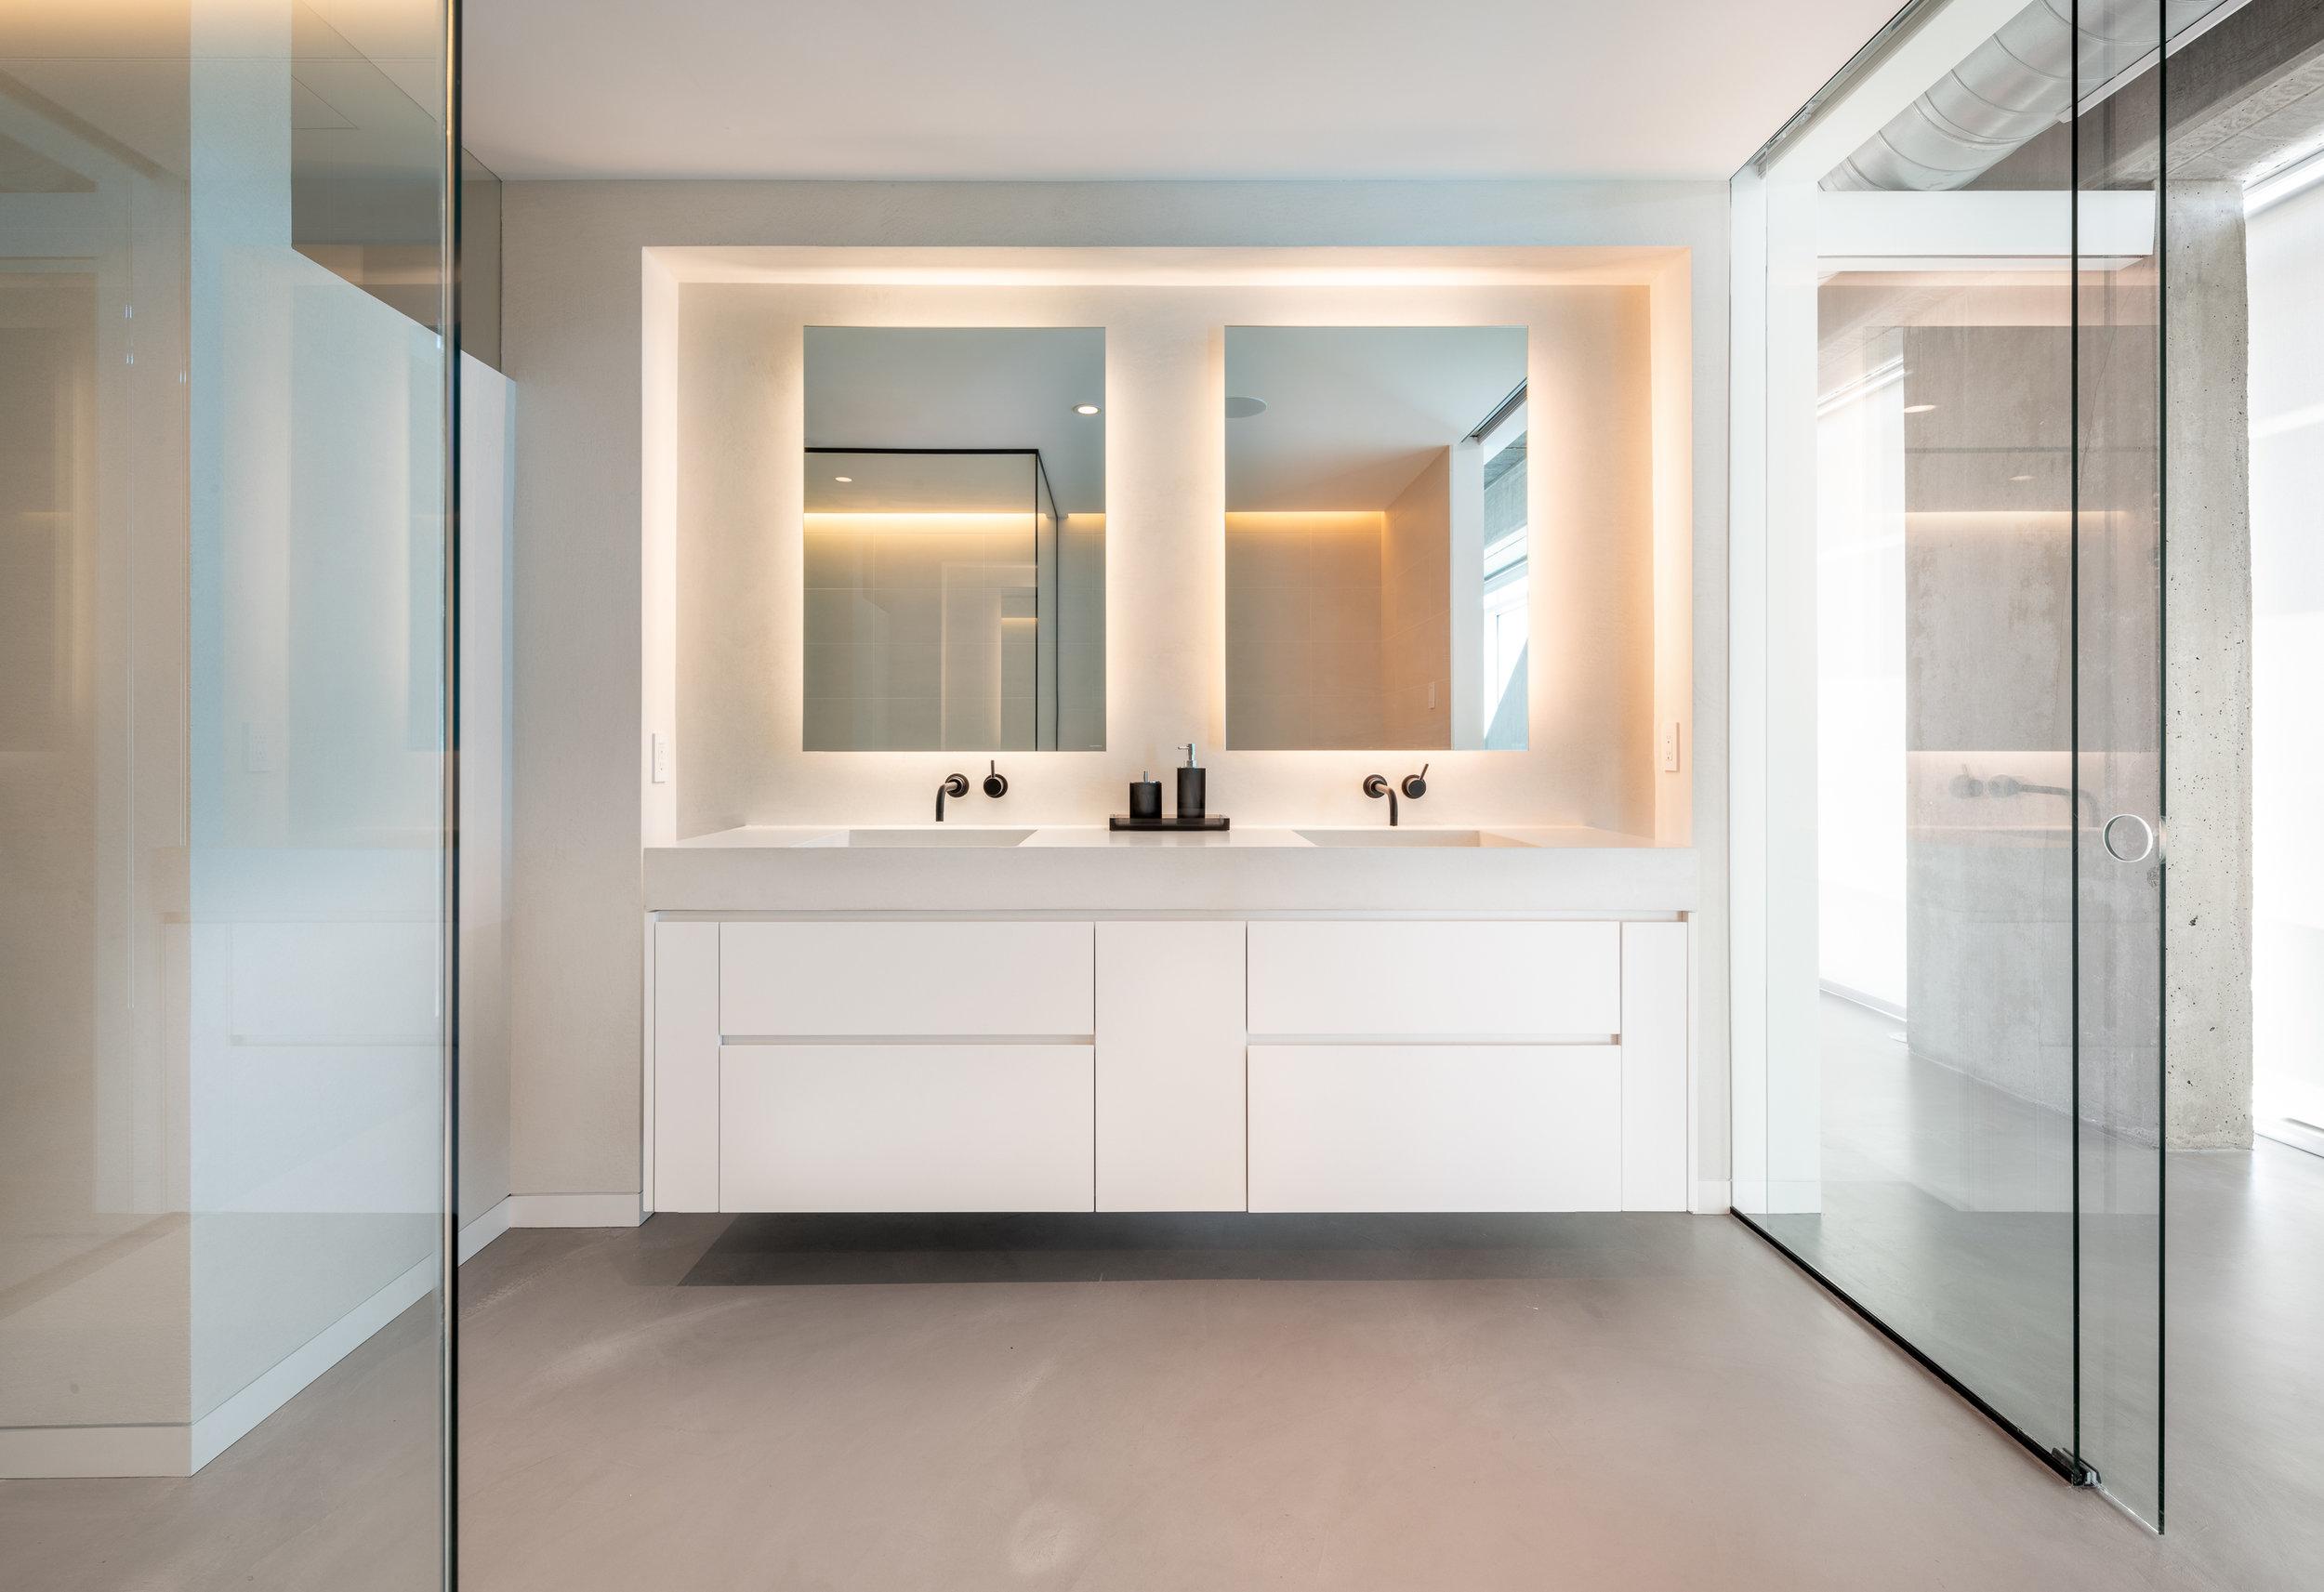 Custom floating bathroom vanity with light cove detail